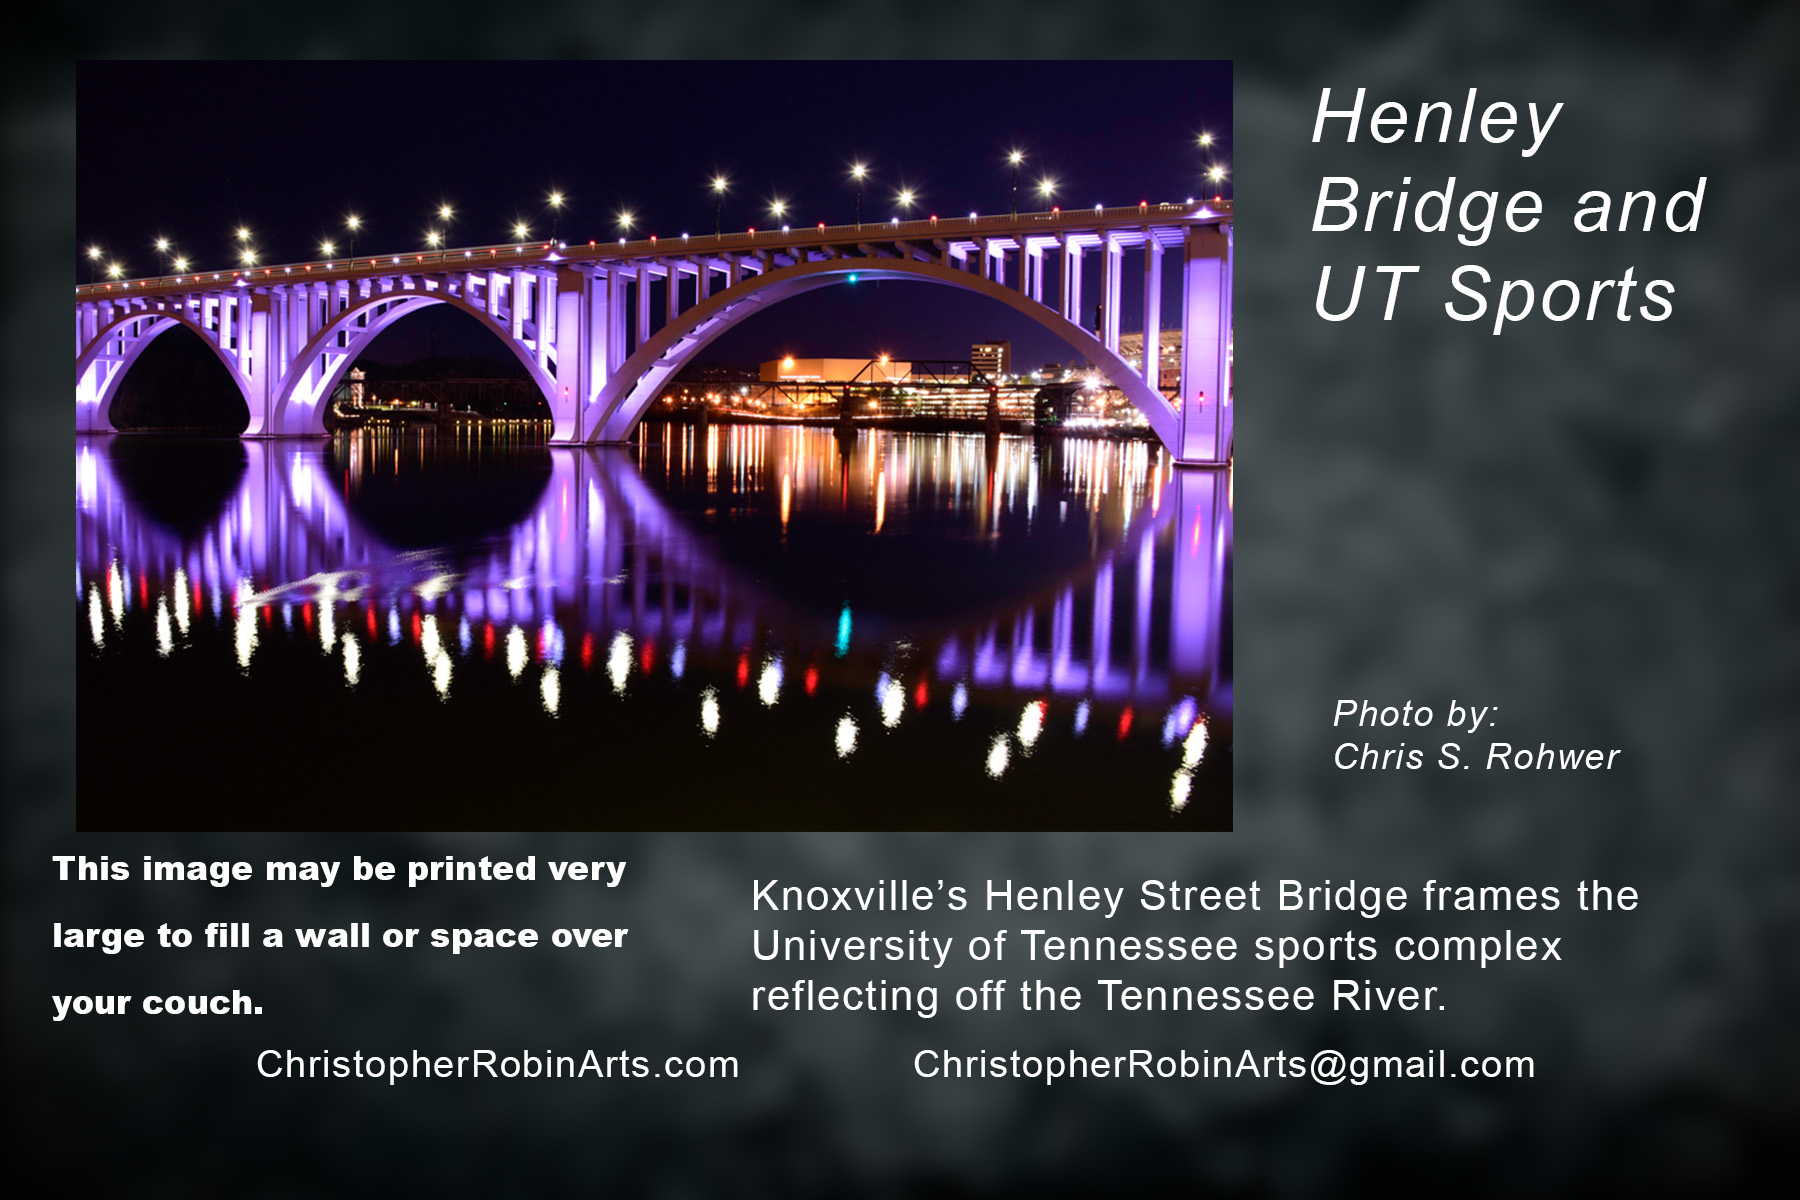 Henley Bridge and UT Sports.jpg